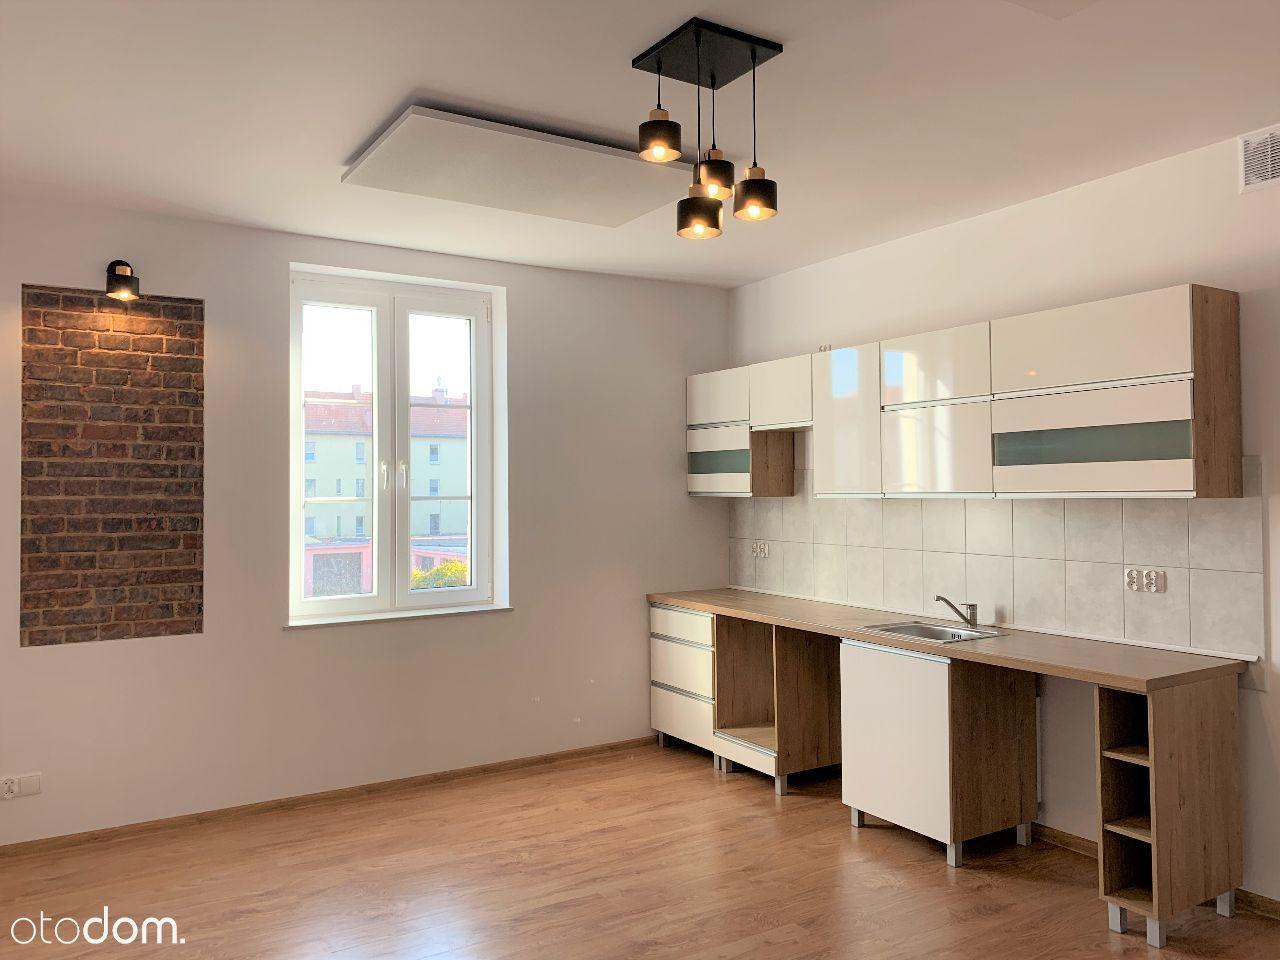 Mieszkanie 38m2 po genralnym remoncie